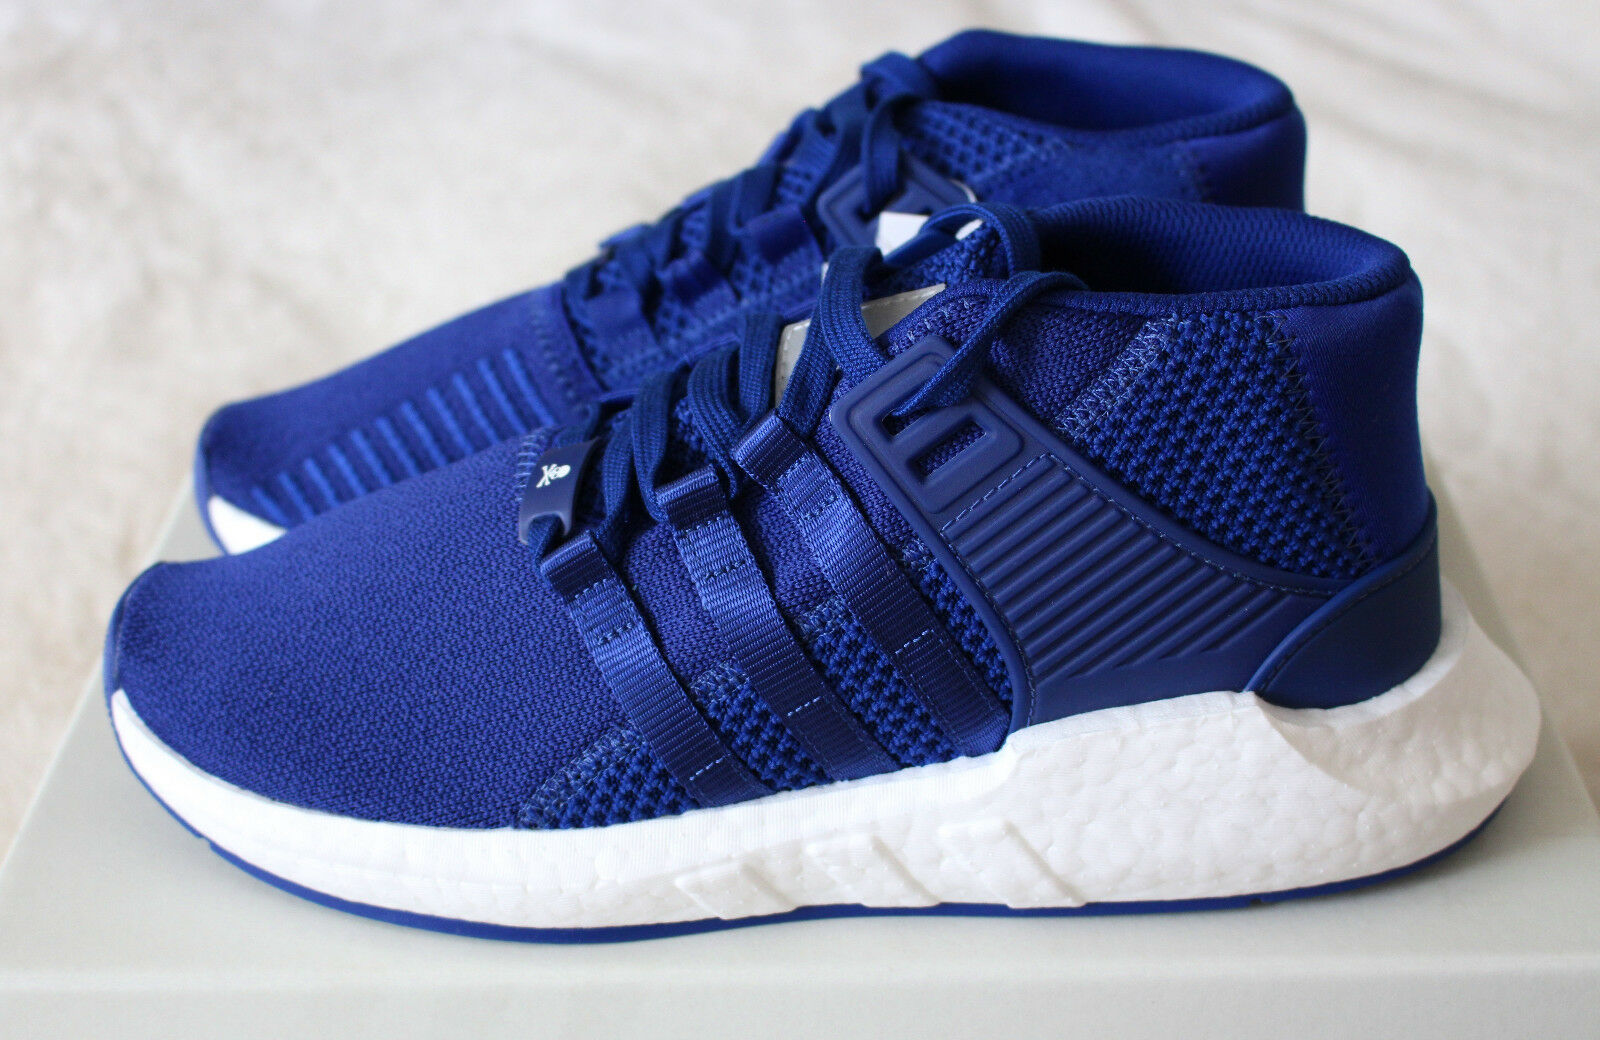 New Adidas MasterMind World EQT Support Mid 93/17 Blue Ink Skull US 8.5